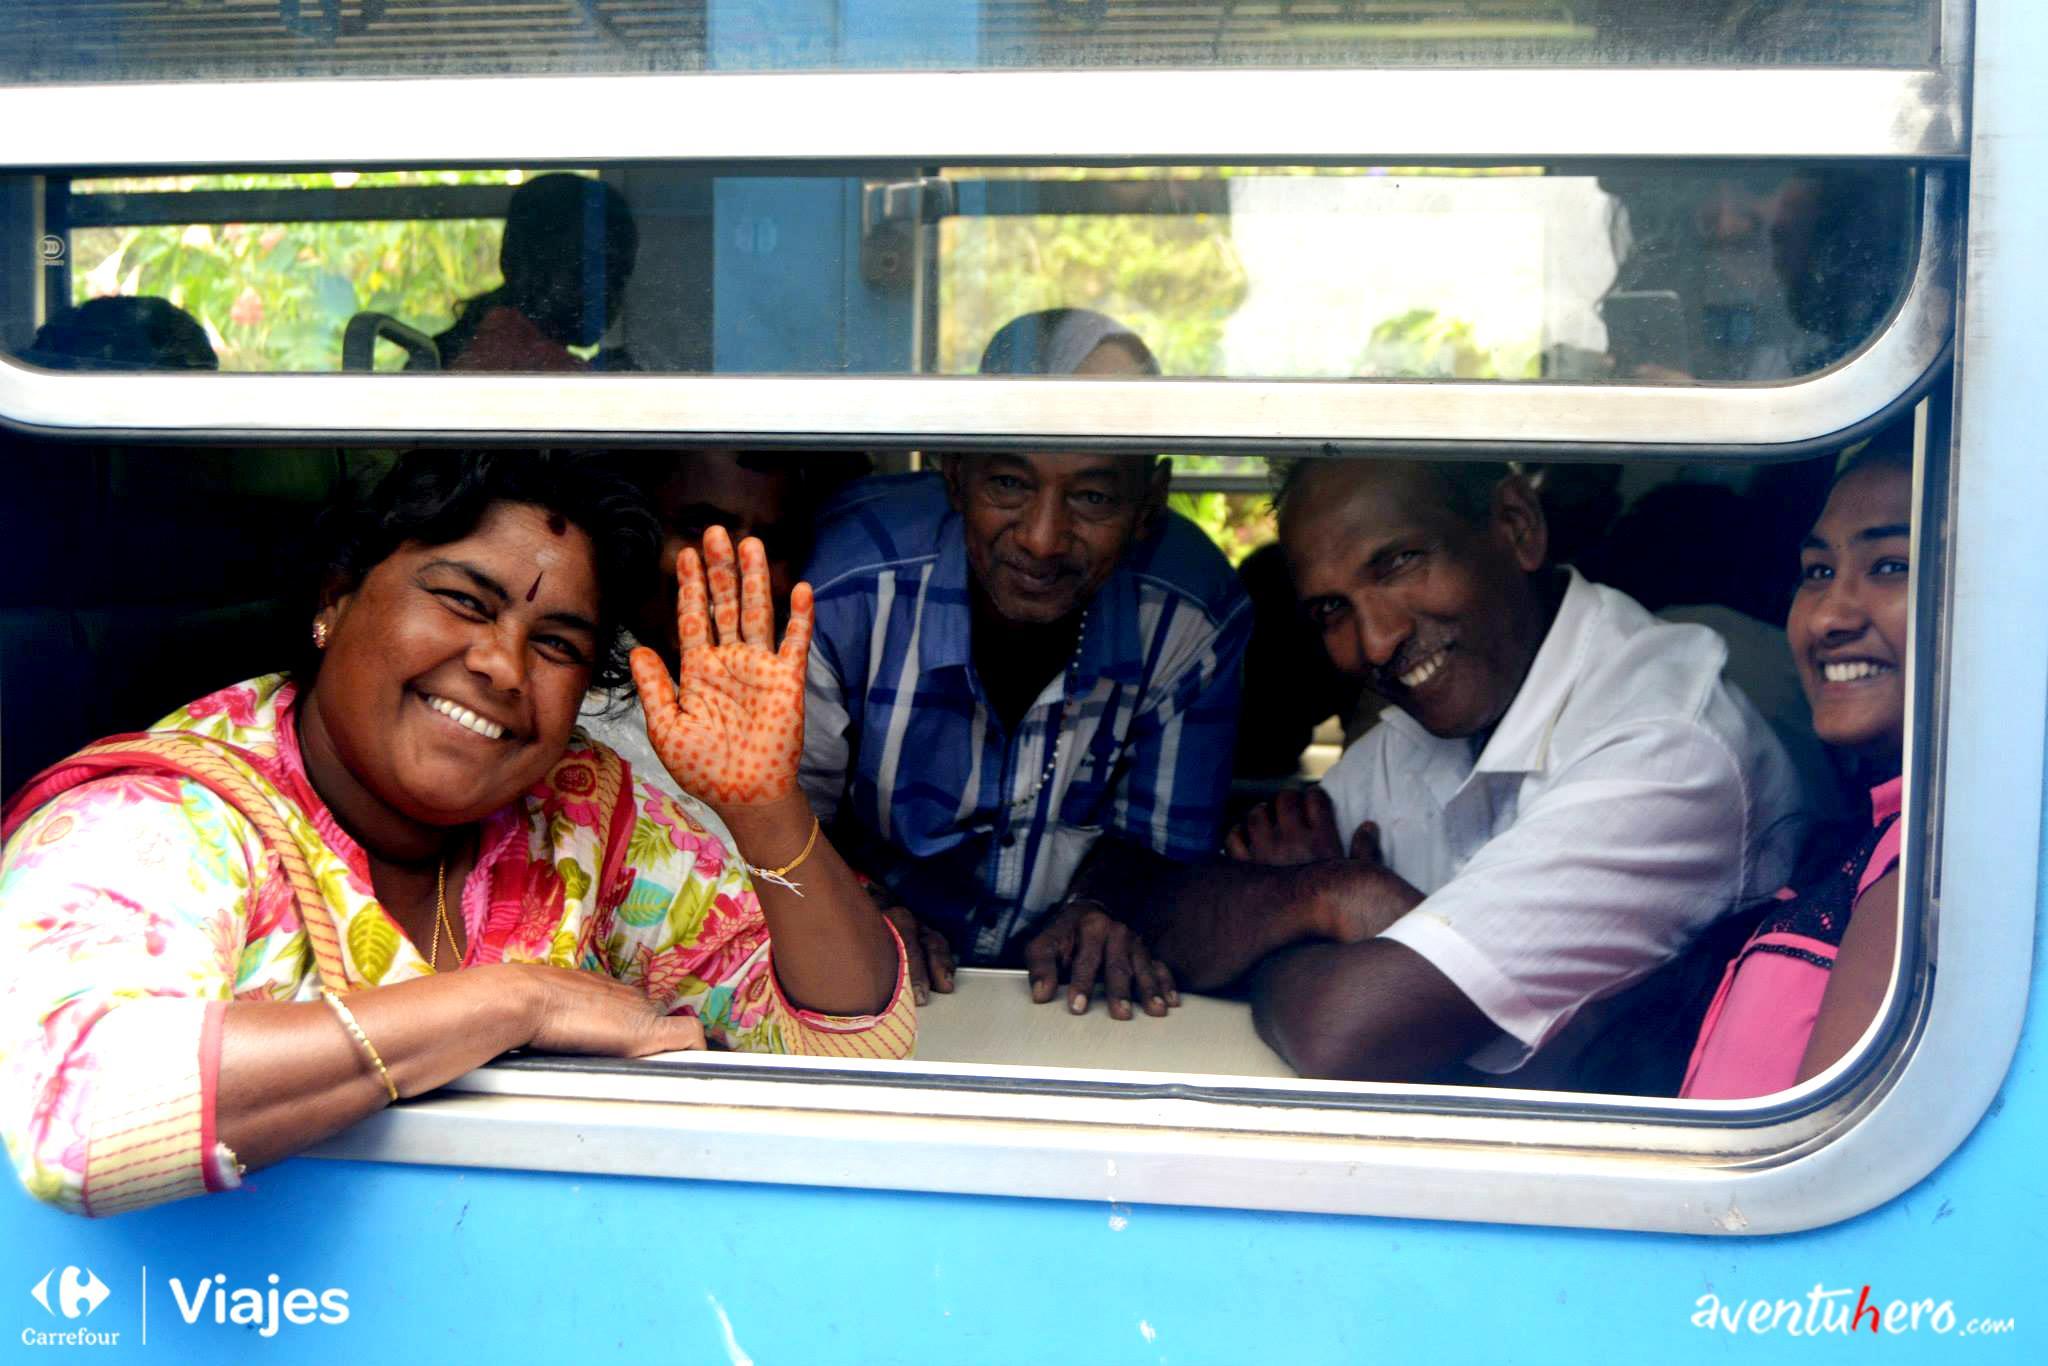 Aventuhero, Sri Lanka - Tren hacia Kandy